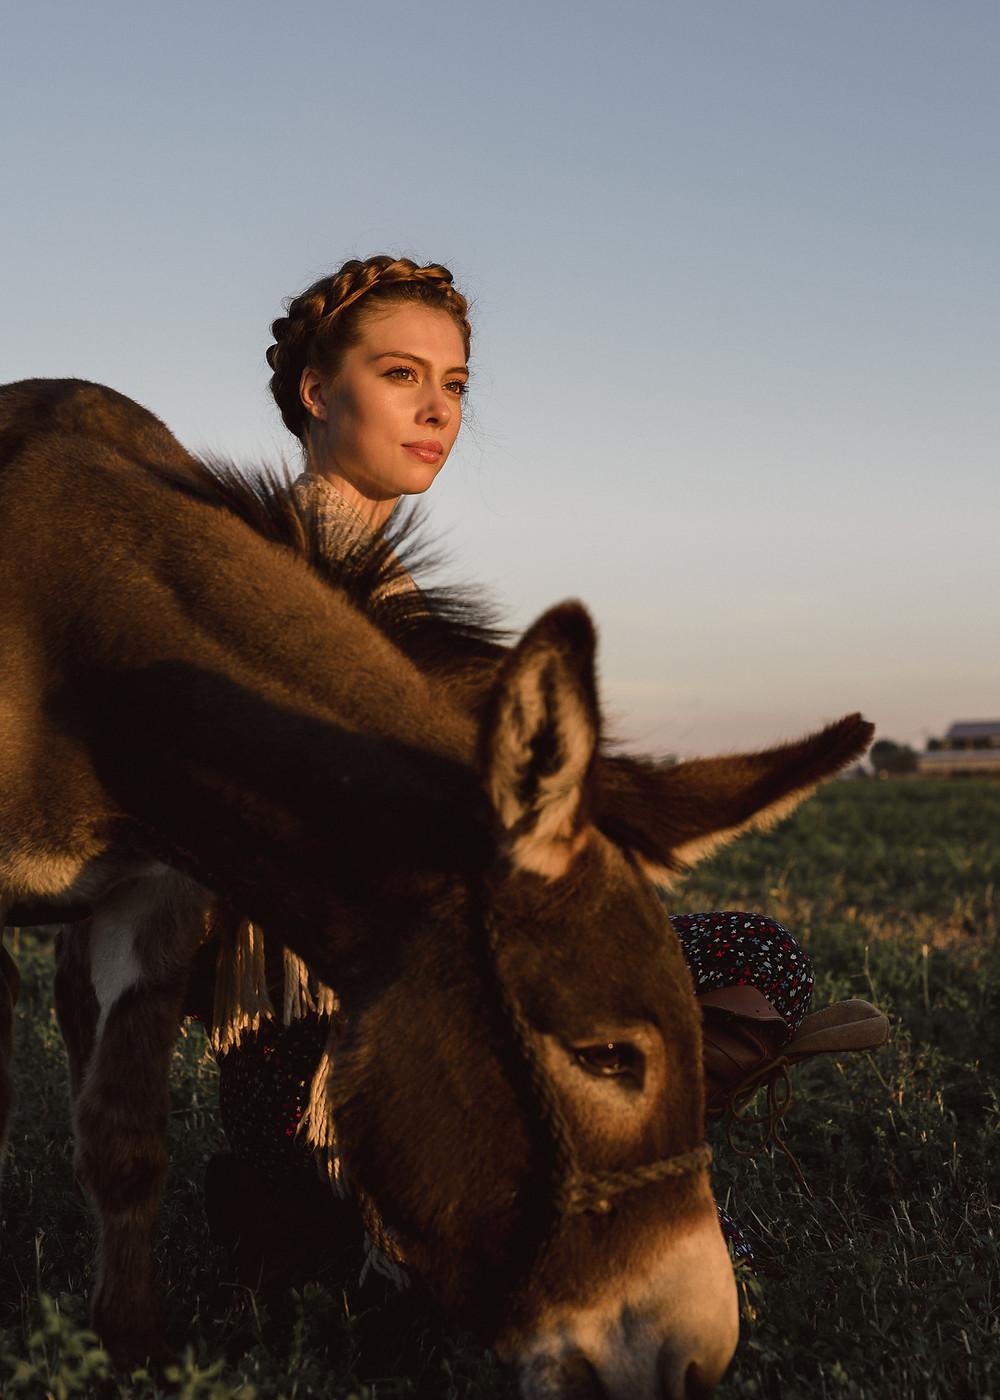 Alissa modeling with the mini donkey